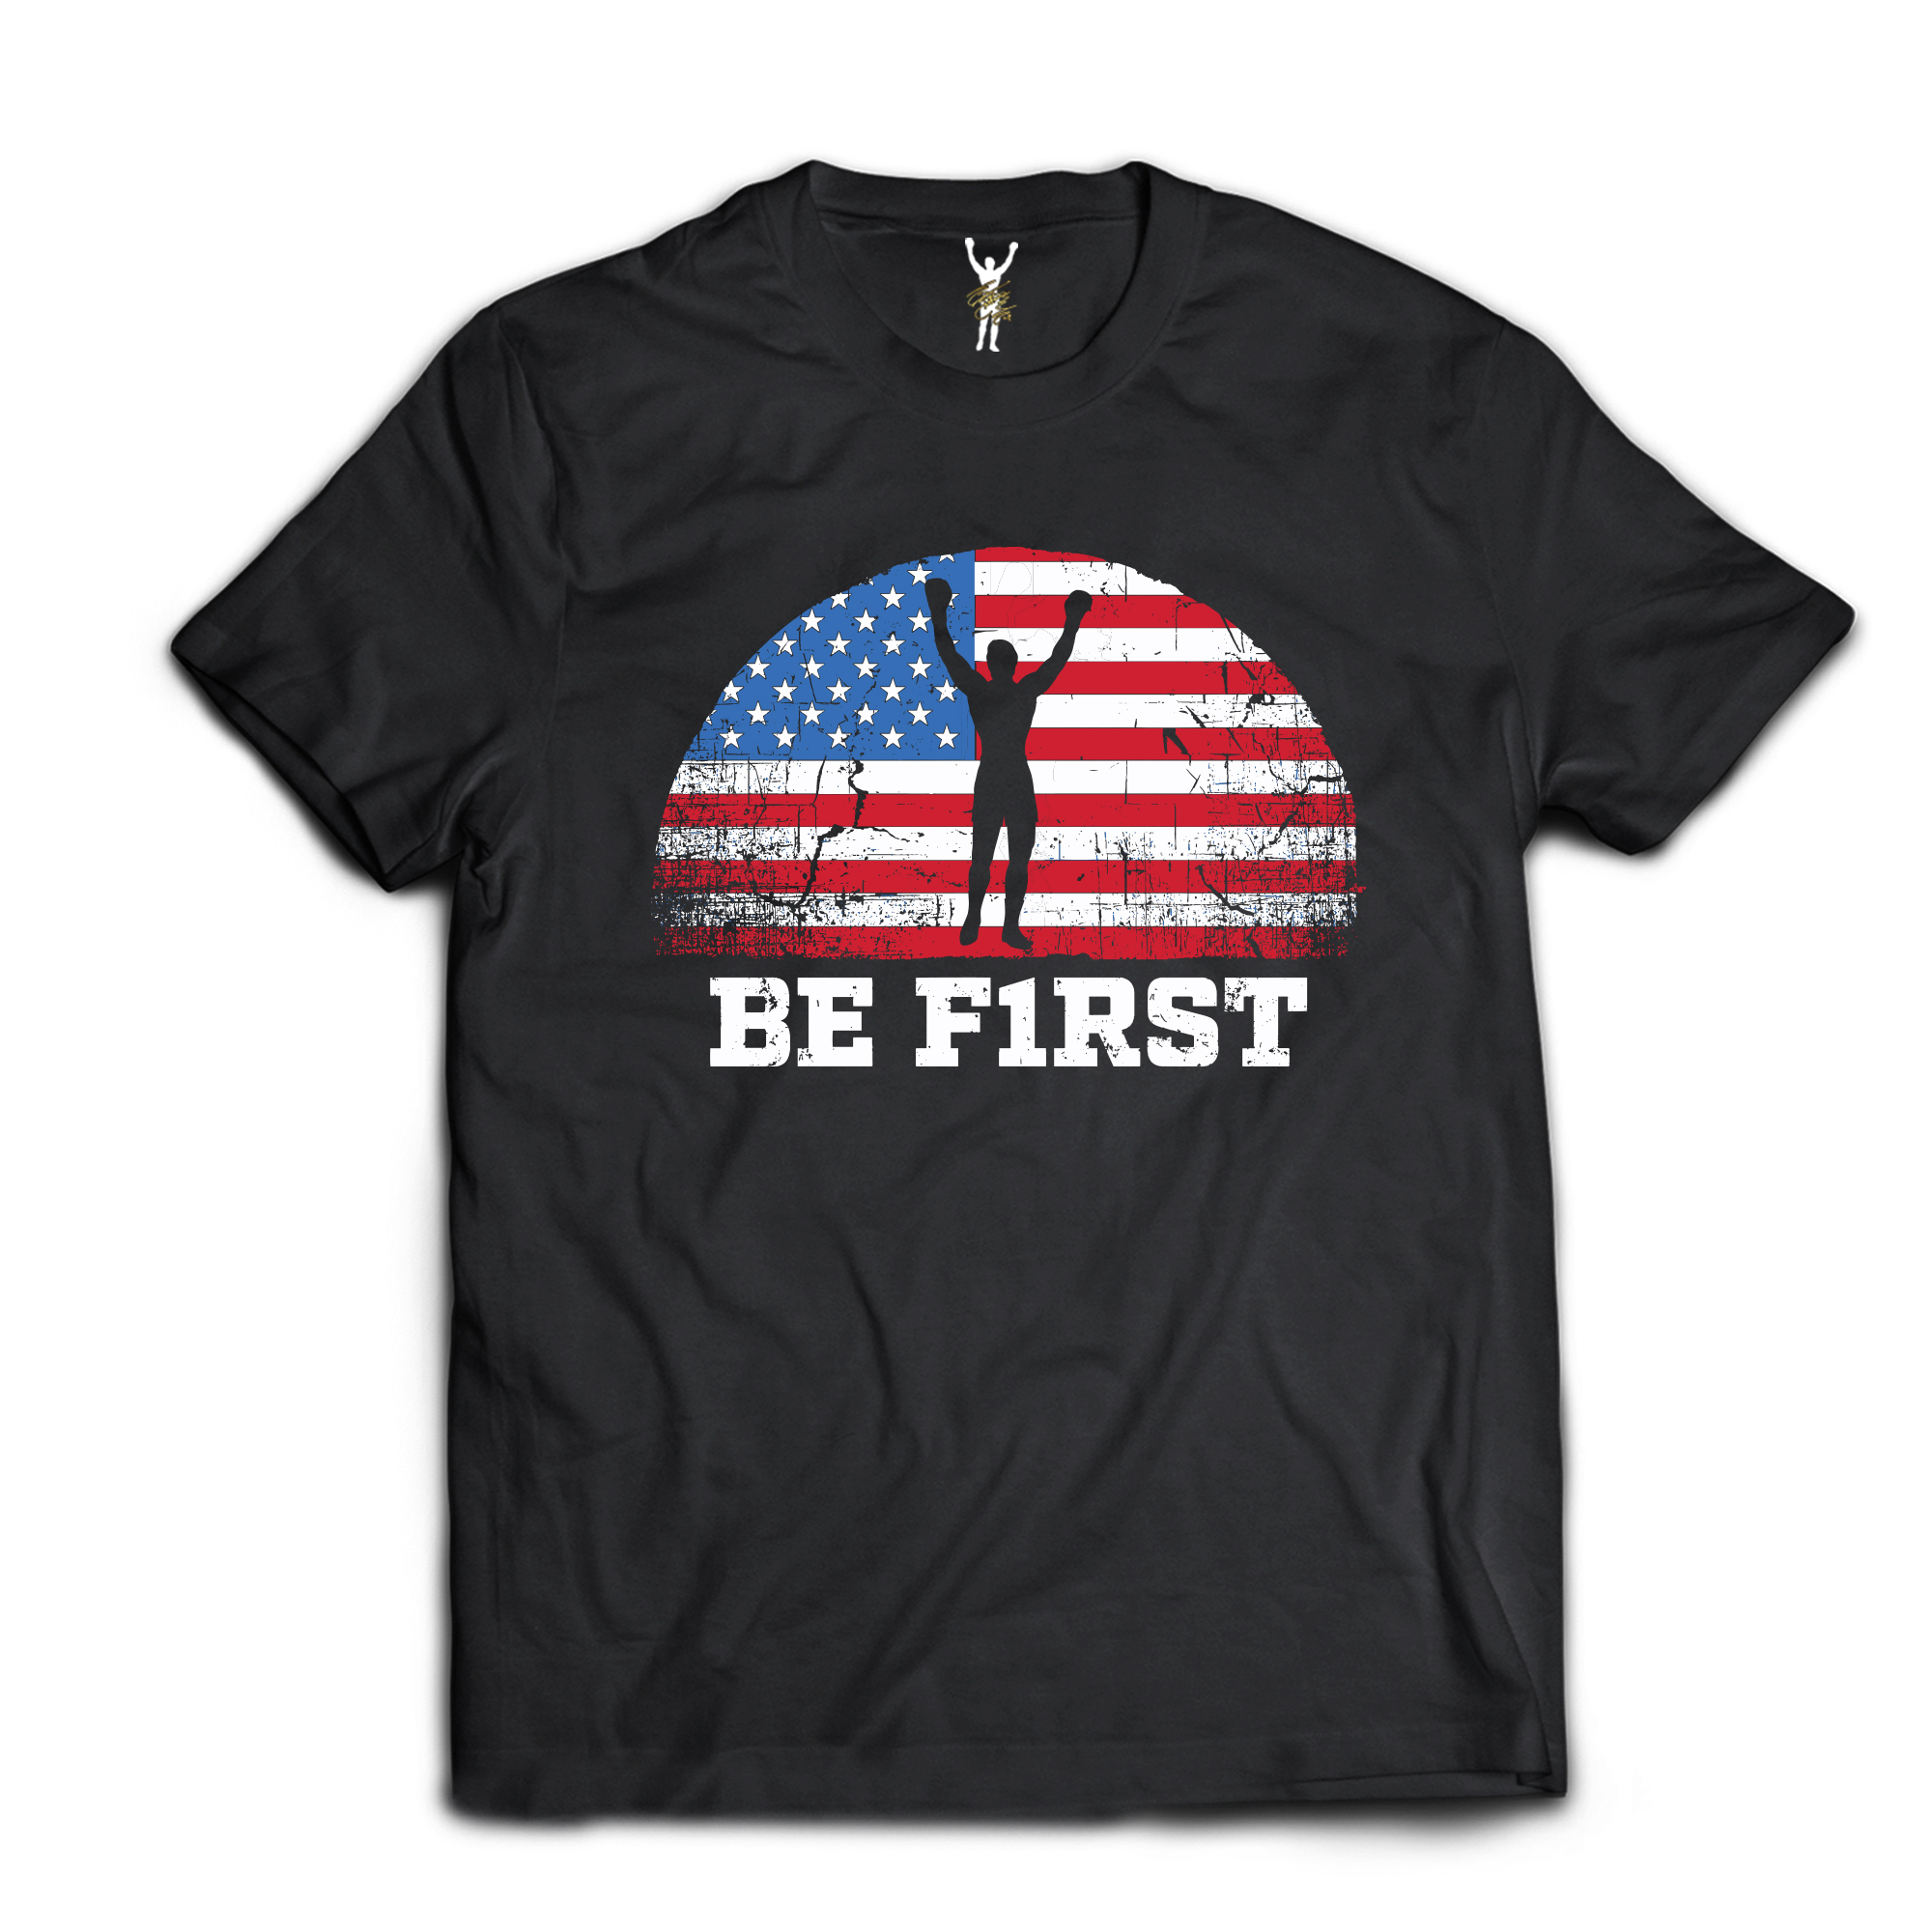 BE F1RST USA Tee